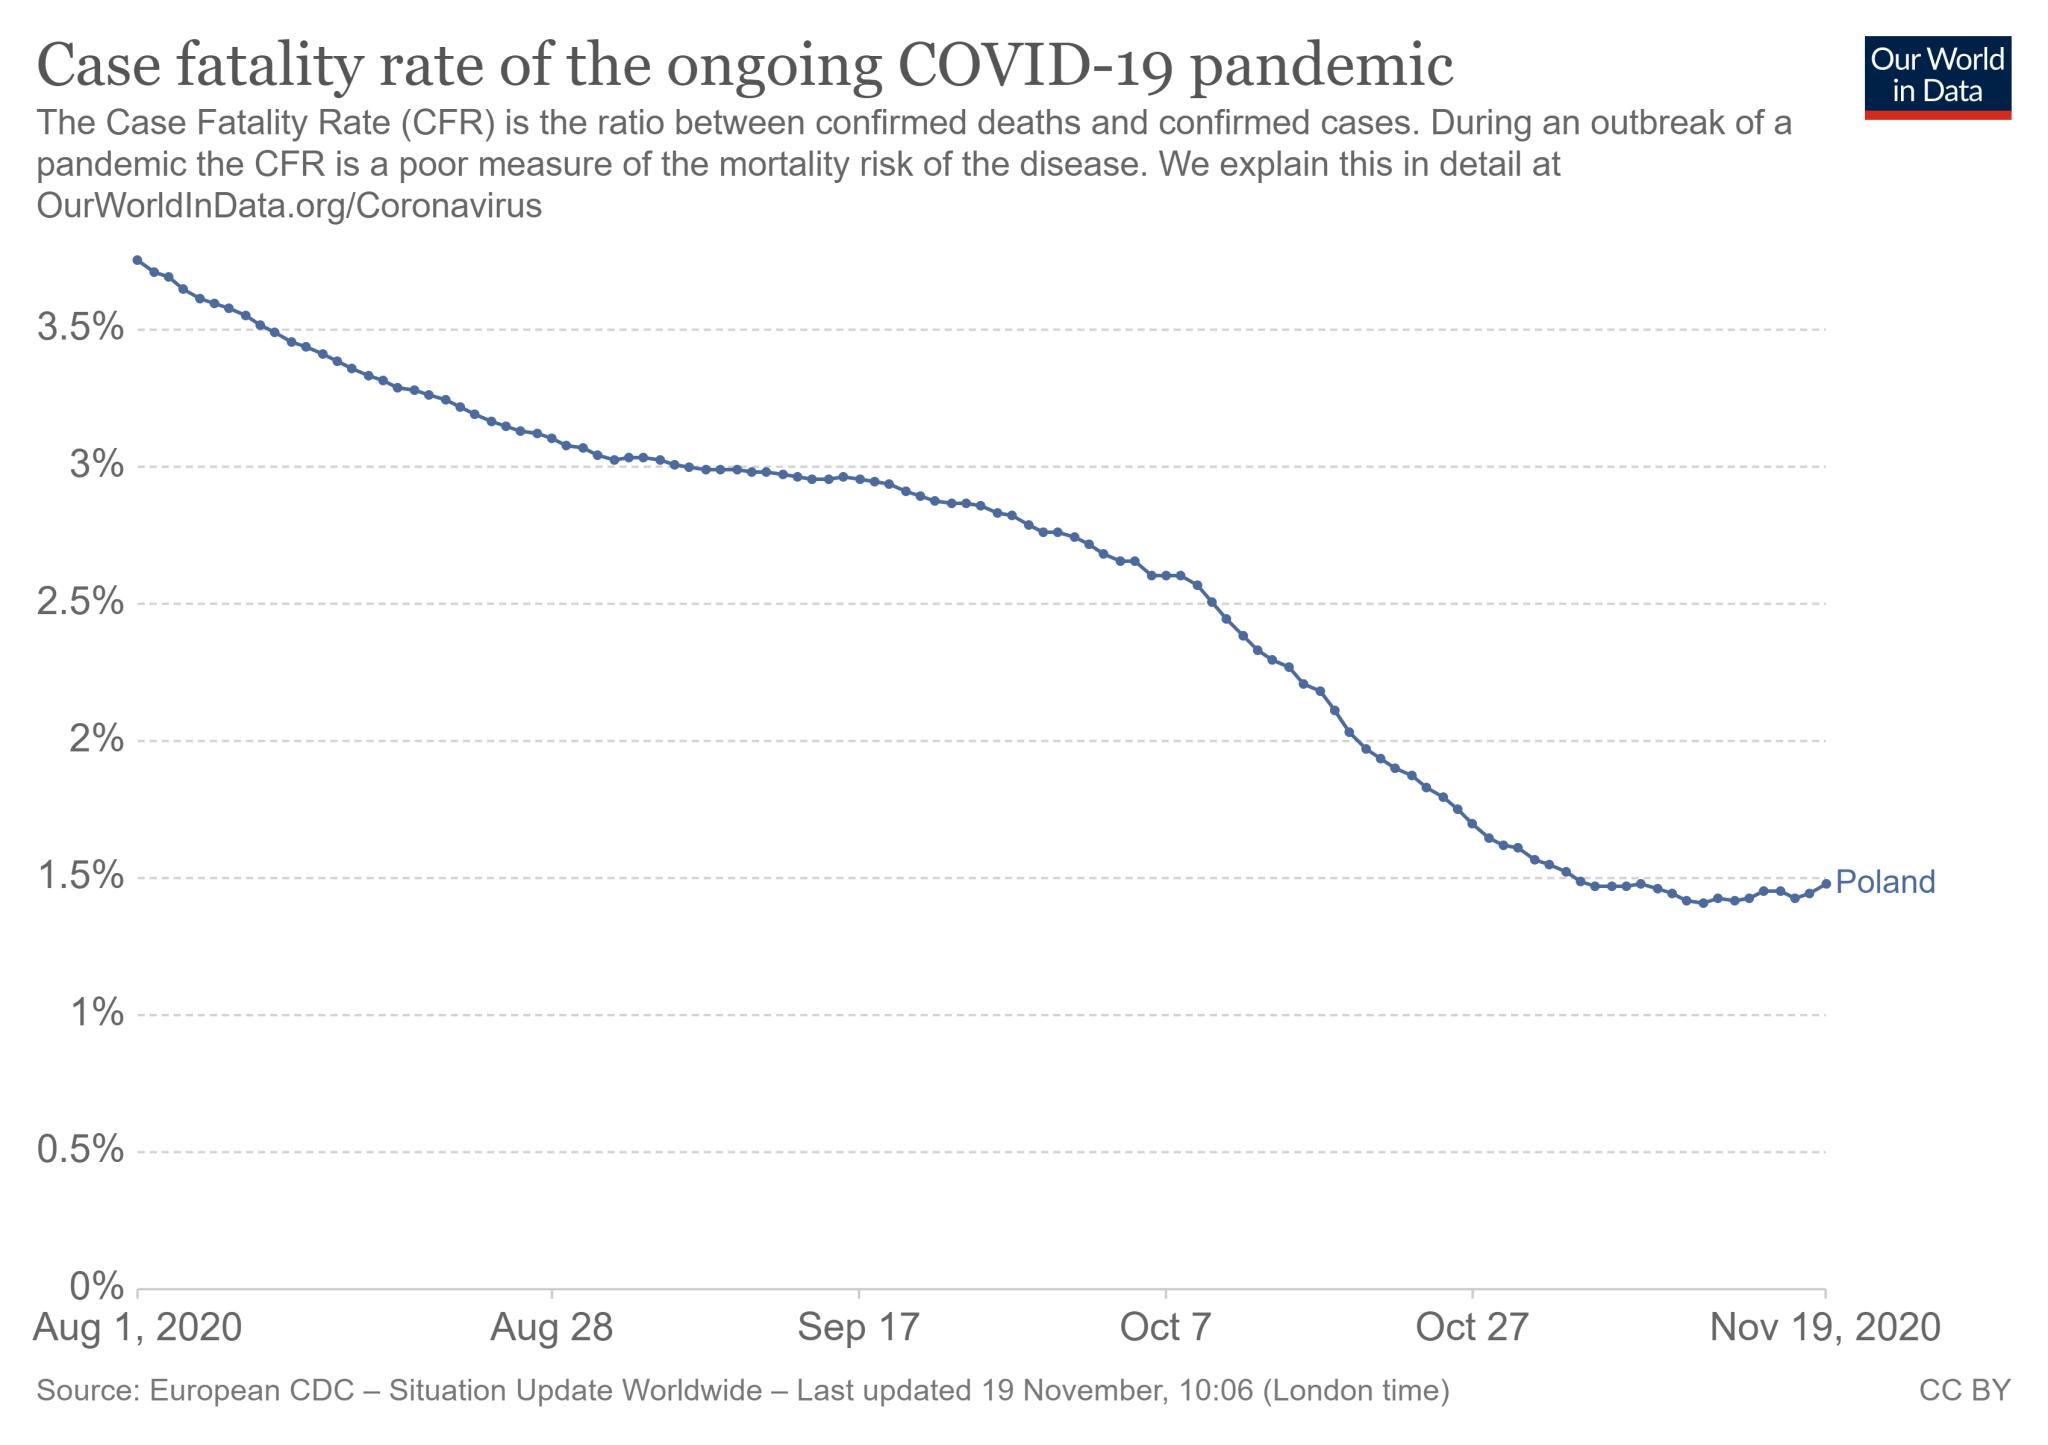 Dynamika wskaźnika CFR dla COVID-19 w Polsce (1 sierpnia - 19 listopada 2020 roku)